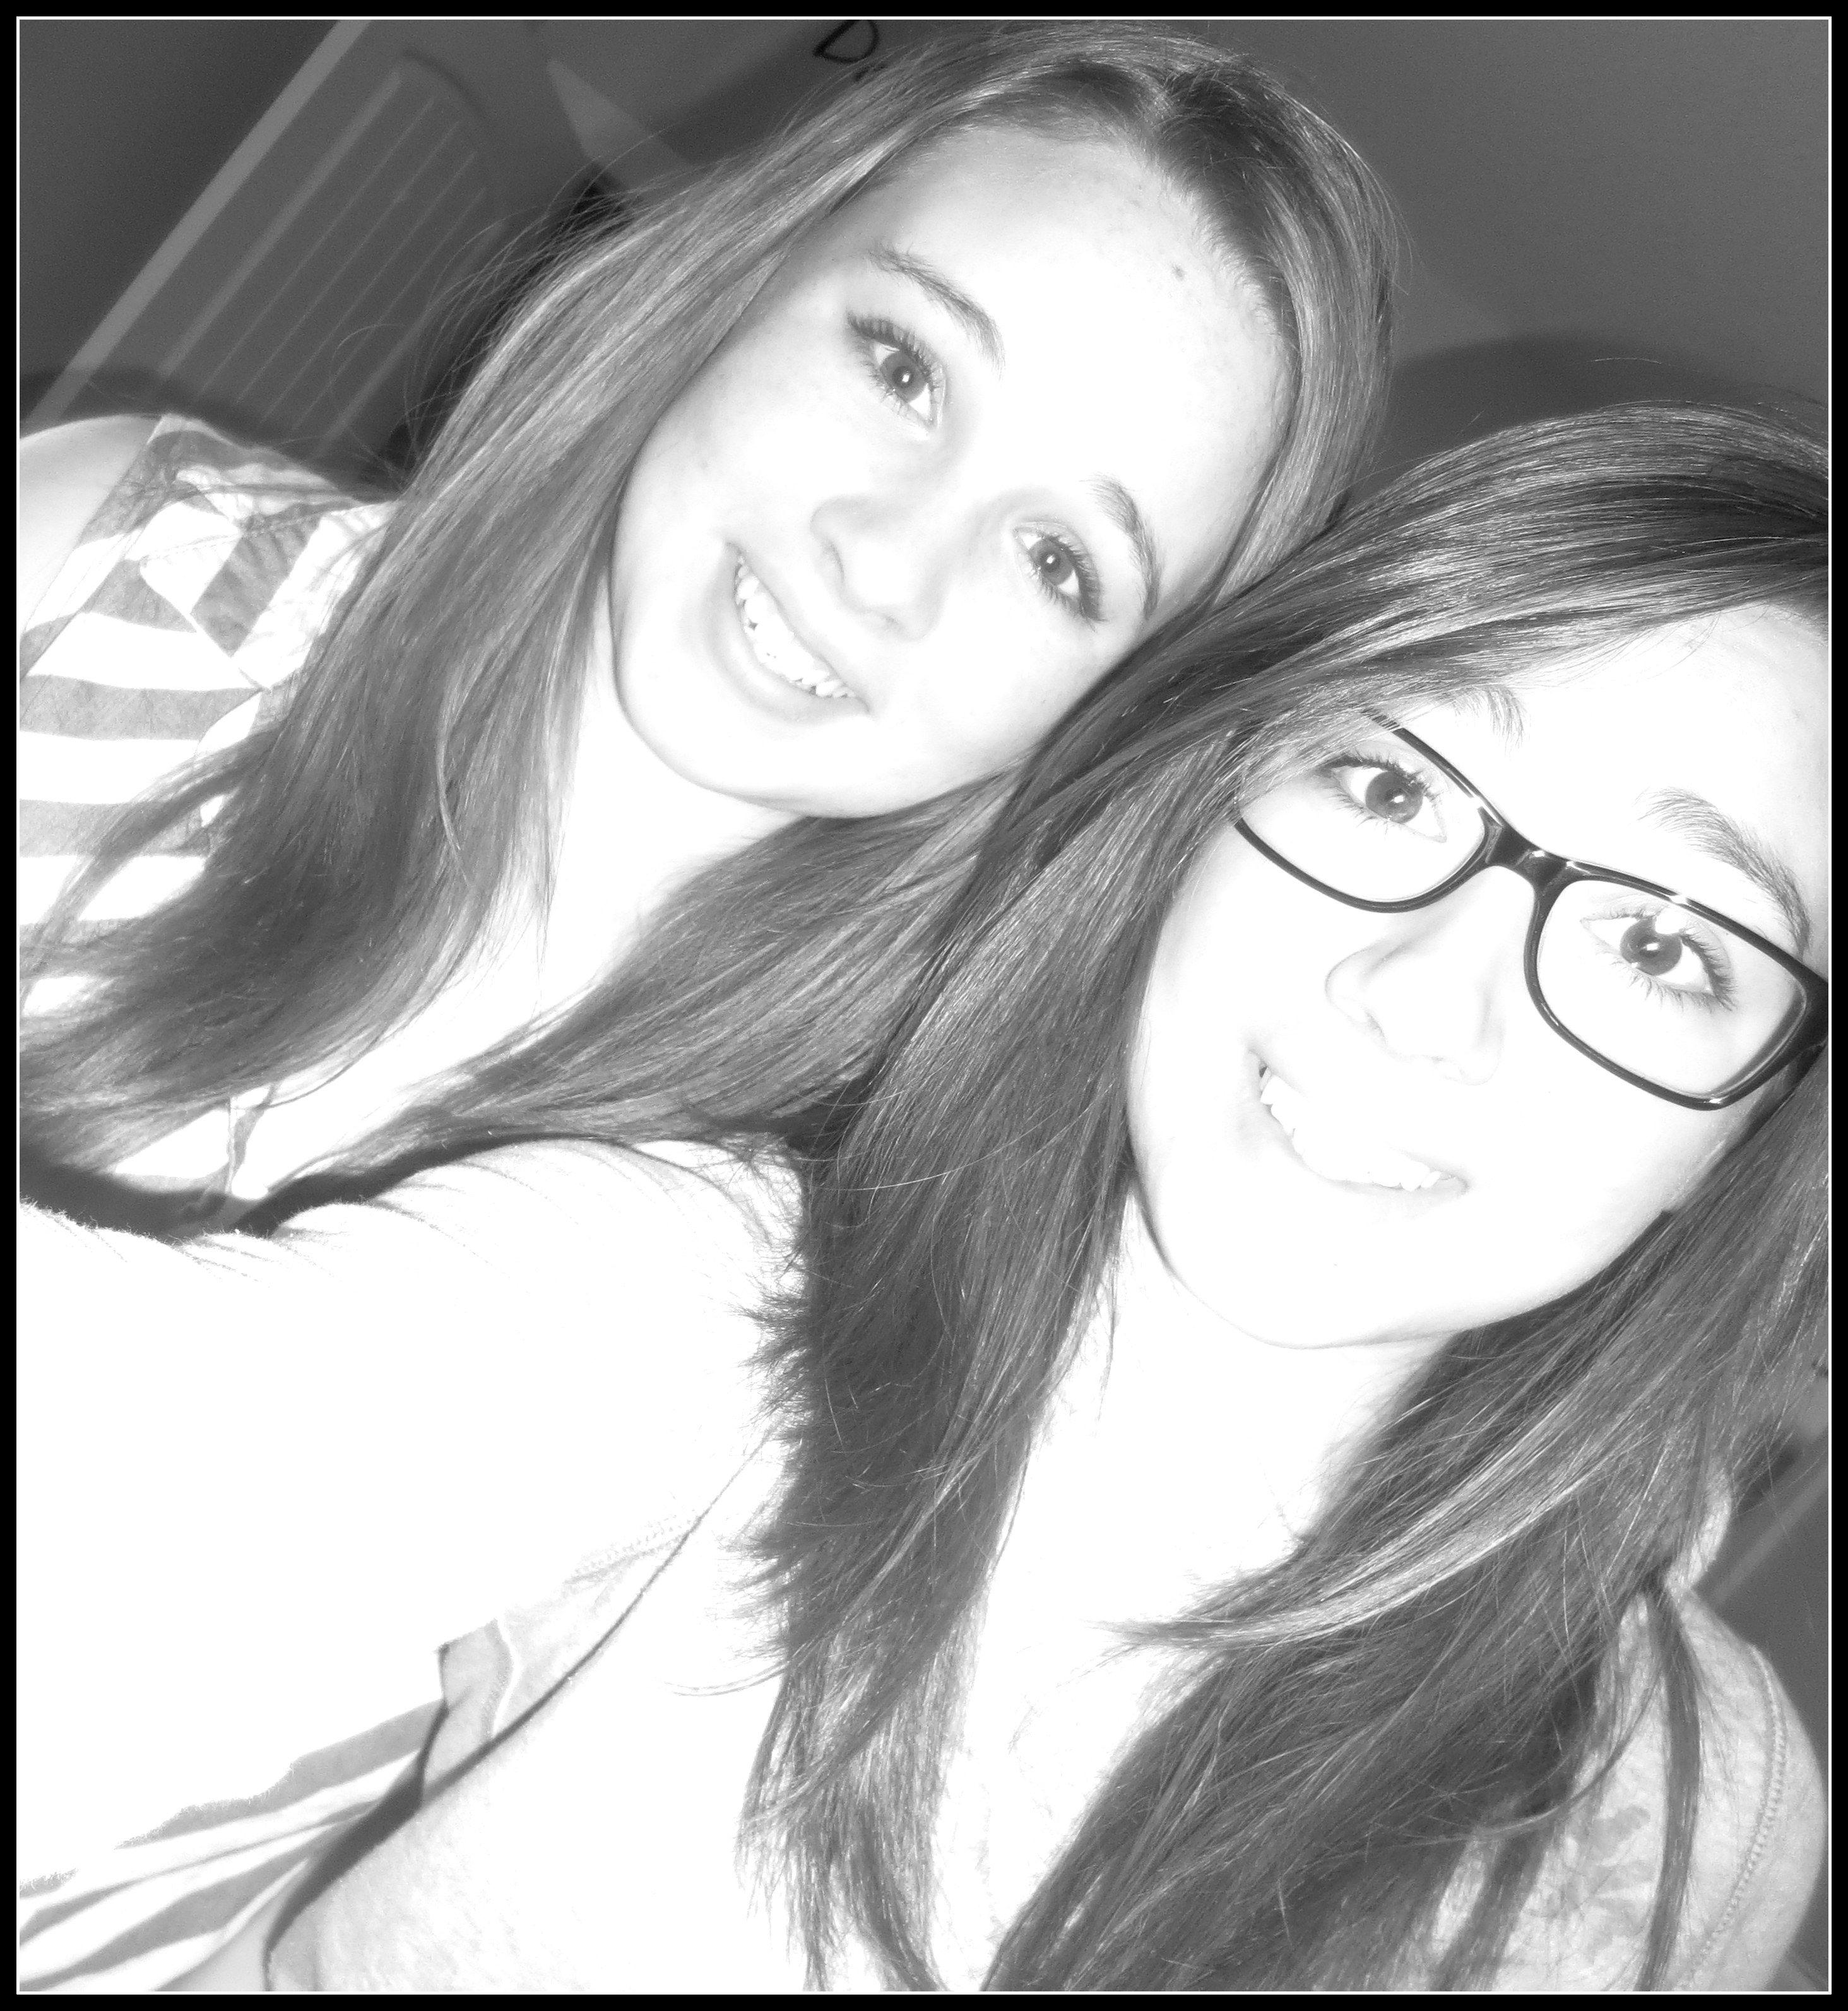 Selfie with my sister new glasses selfies pinterest